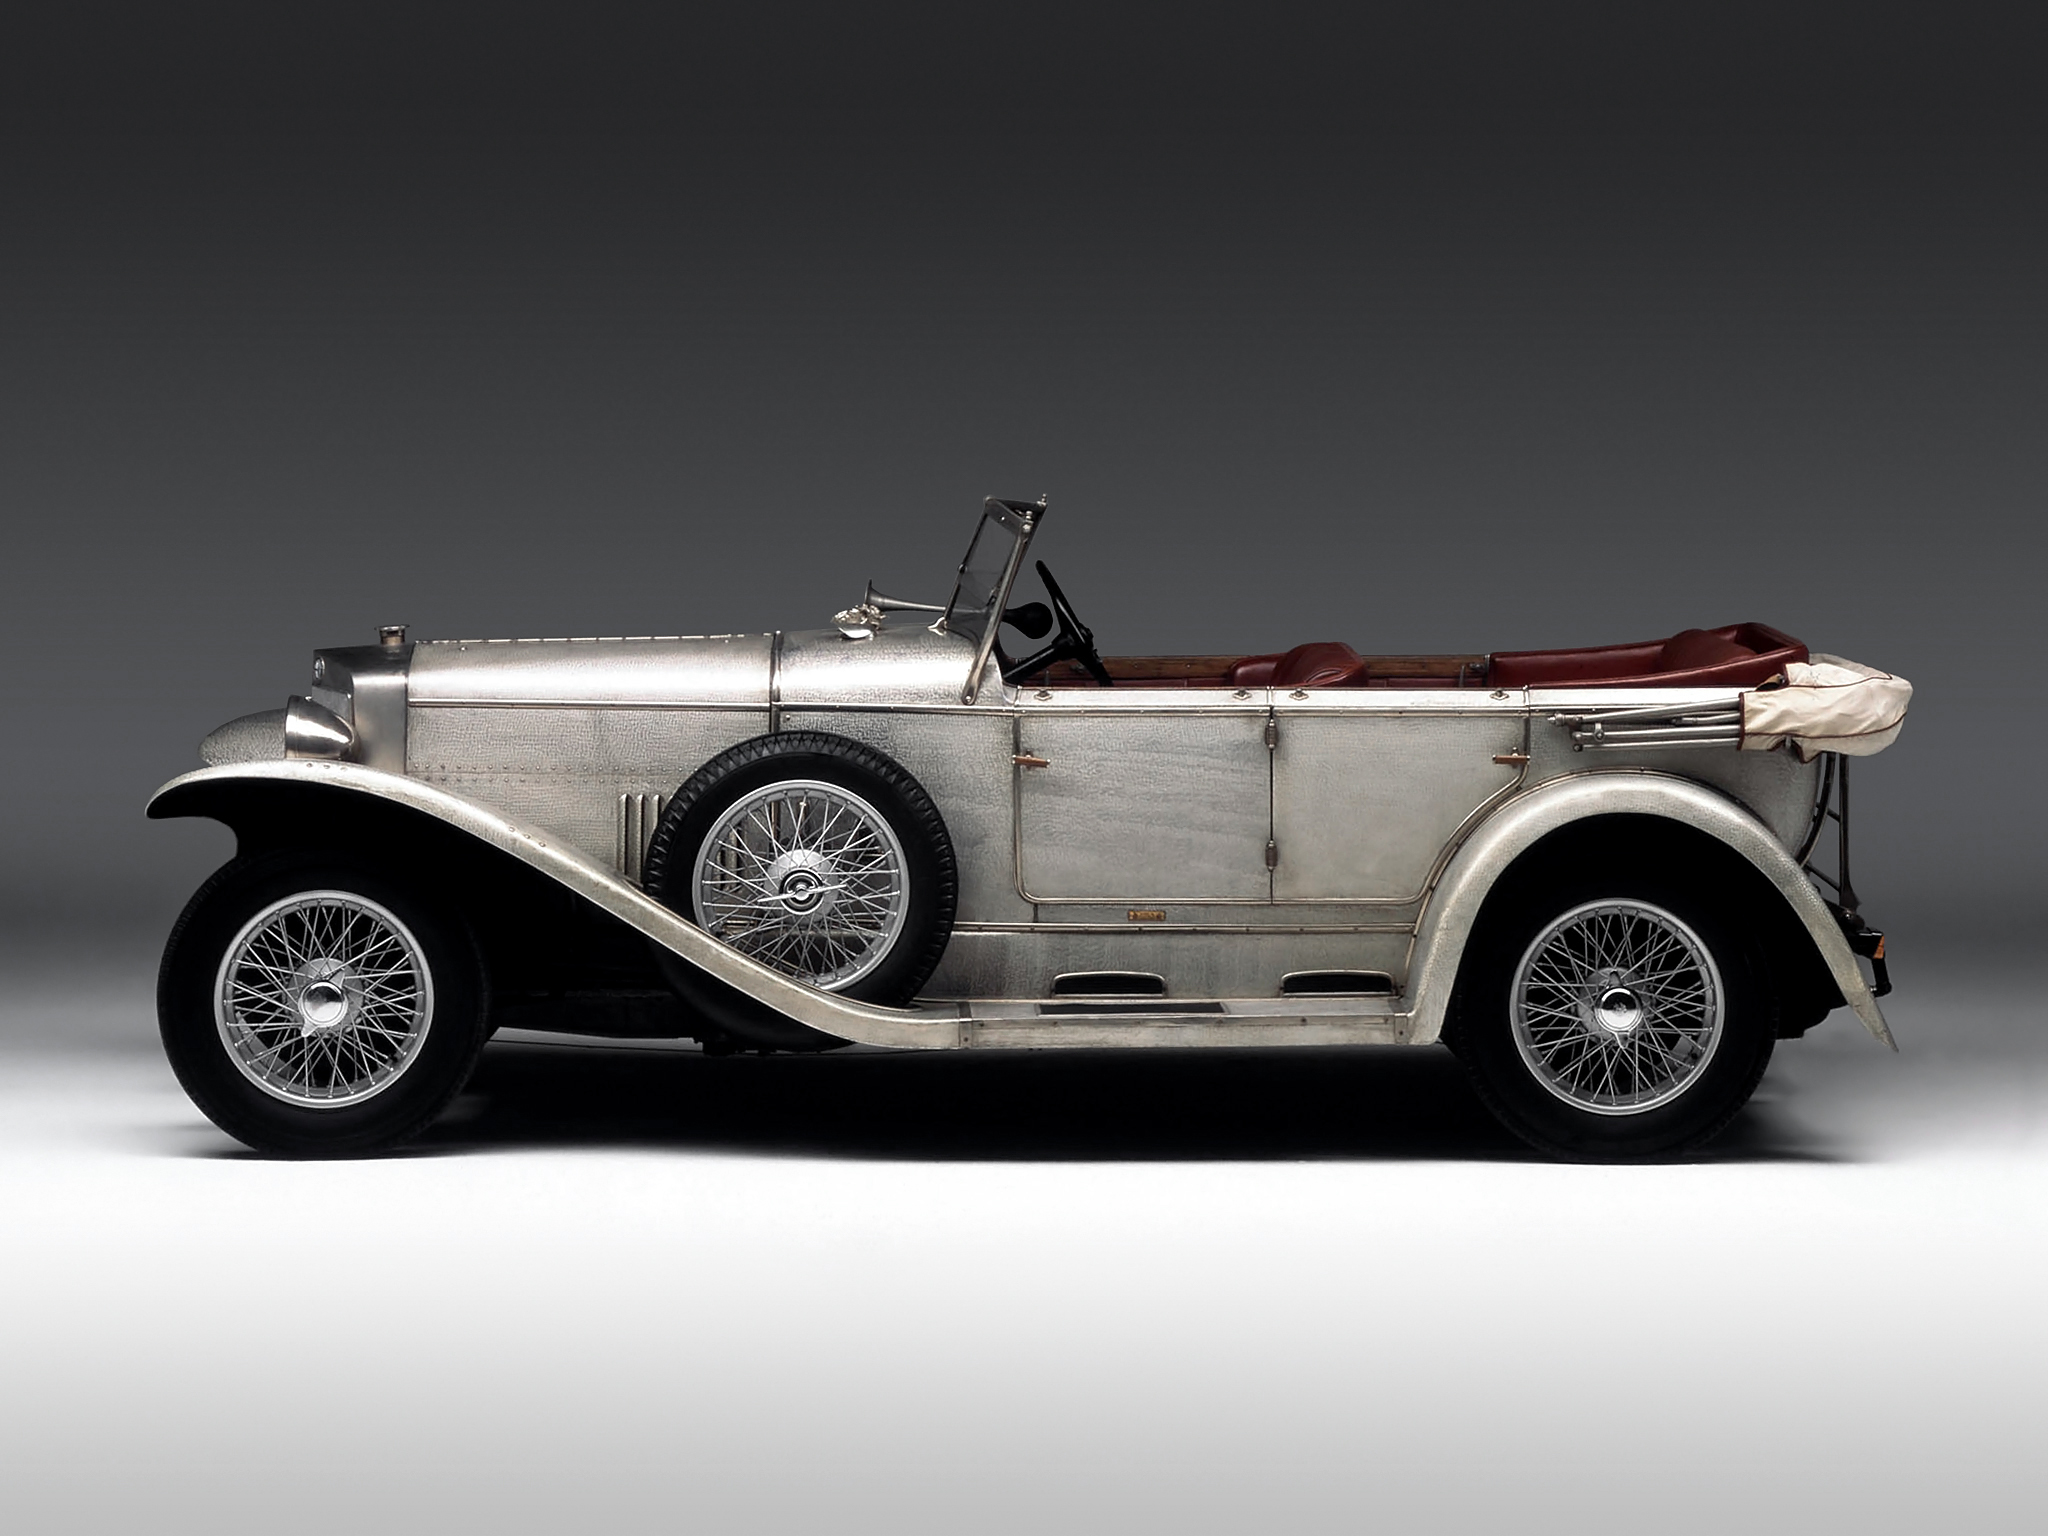 1925-Castagna-Alfa-Romeo-RLSS-03